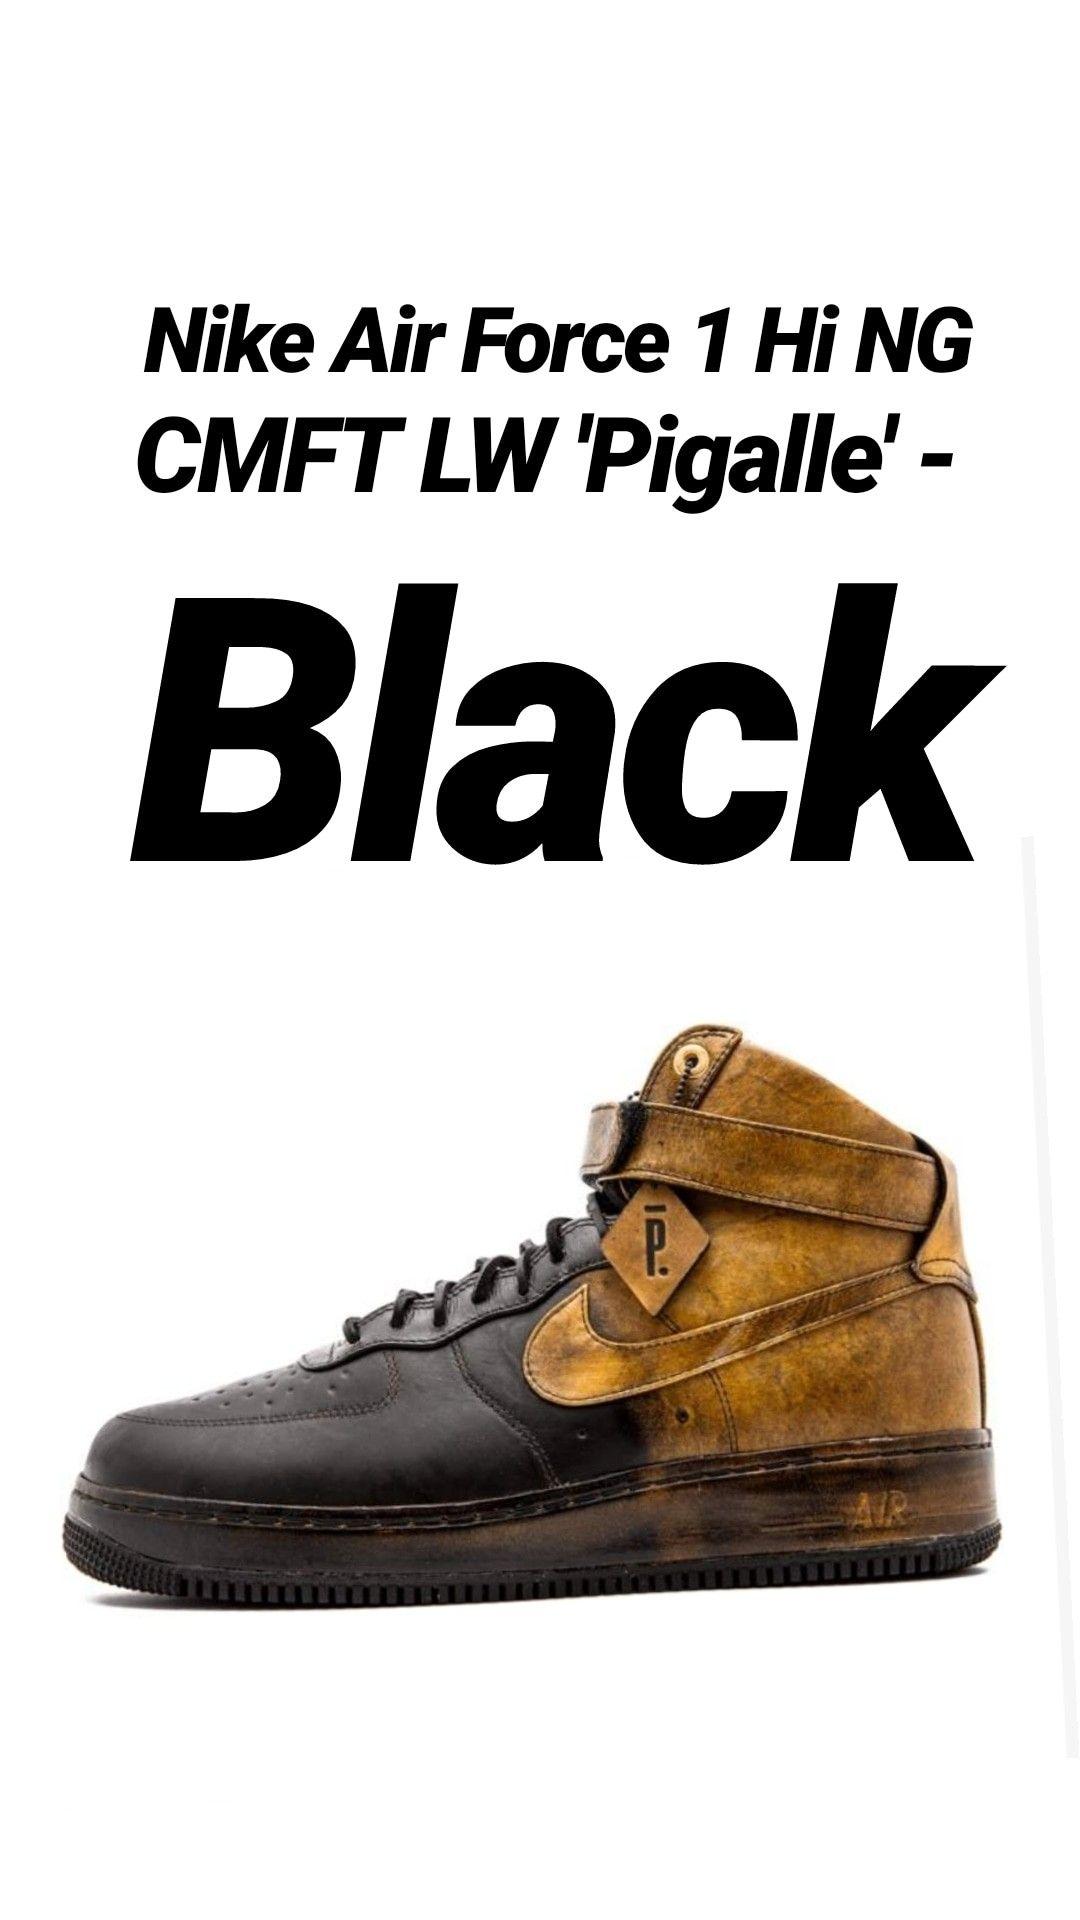 online retailer 1c5b4 c6258 Nike Air Force 1 Hi NG CMFT LW Pigalle - Black.